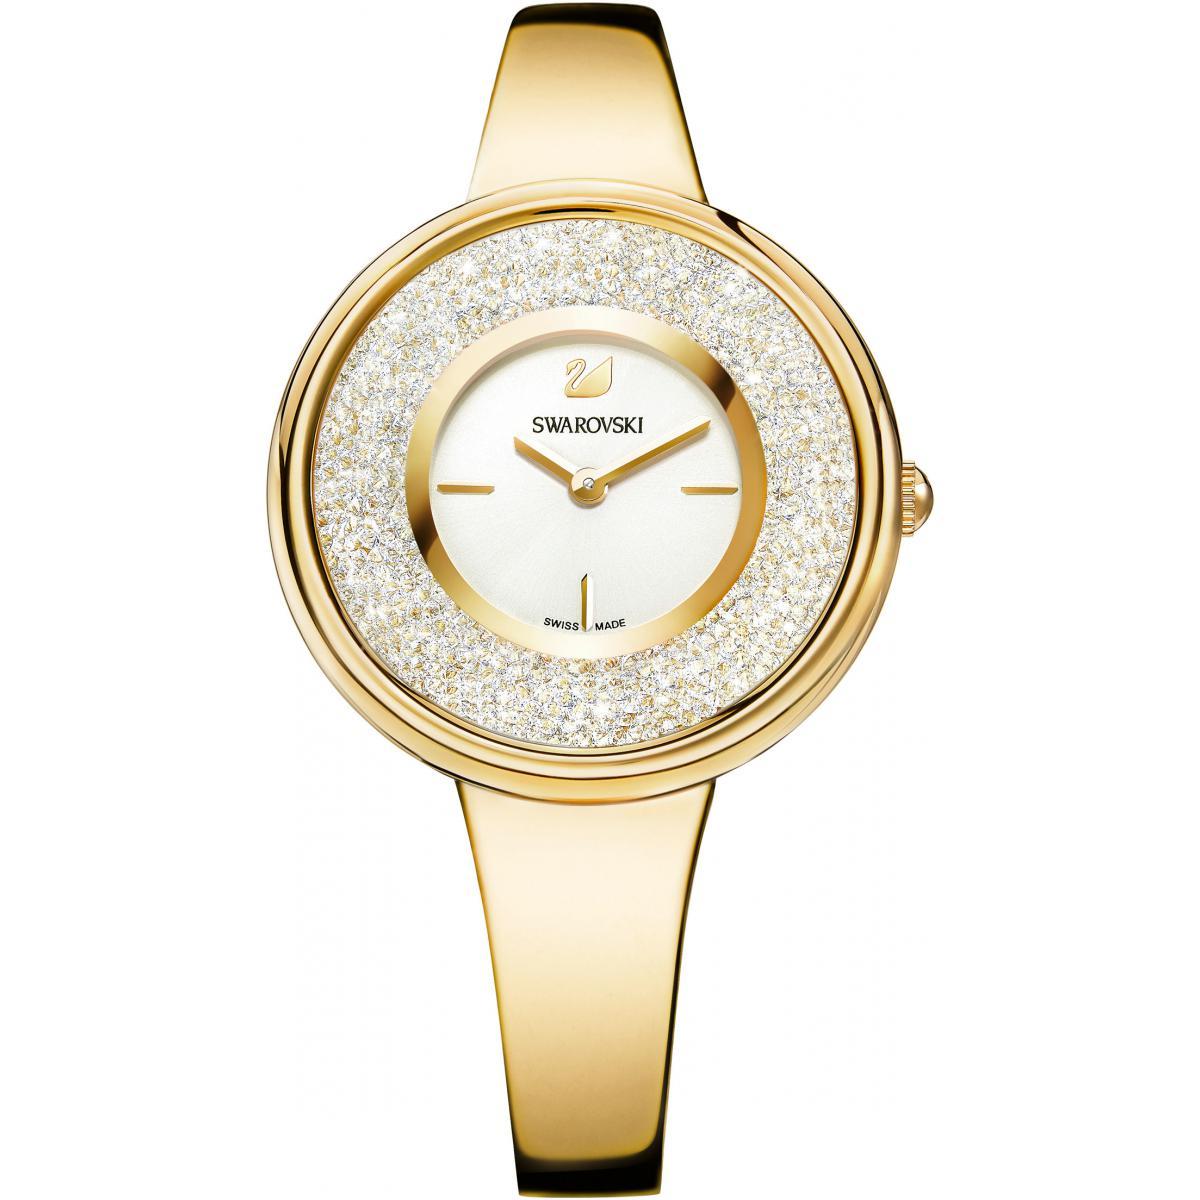 Montre Swarovski Crystalline Pure 5269253 - Montre Acier Dorée Cristaux  Swarovski Femme